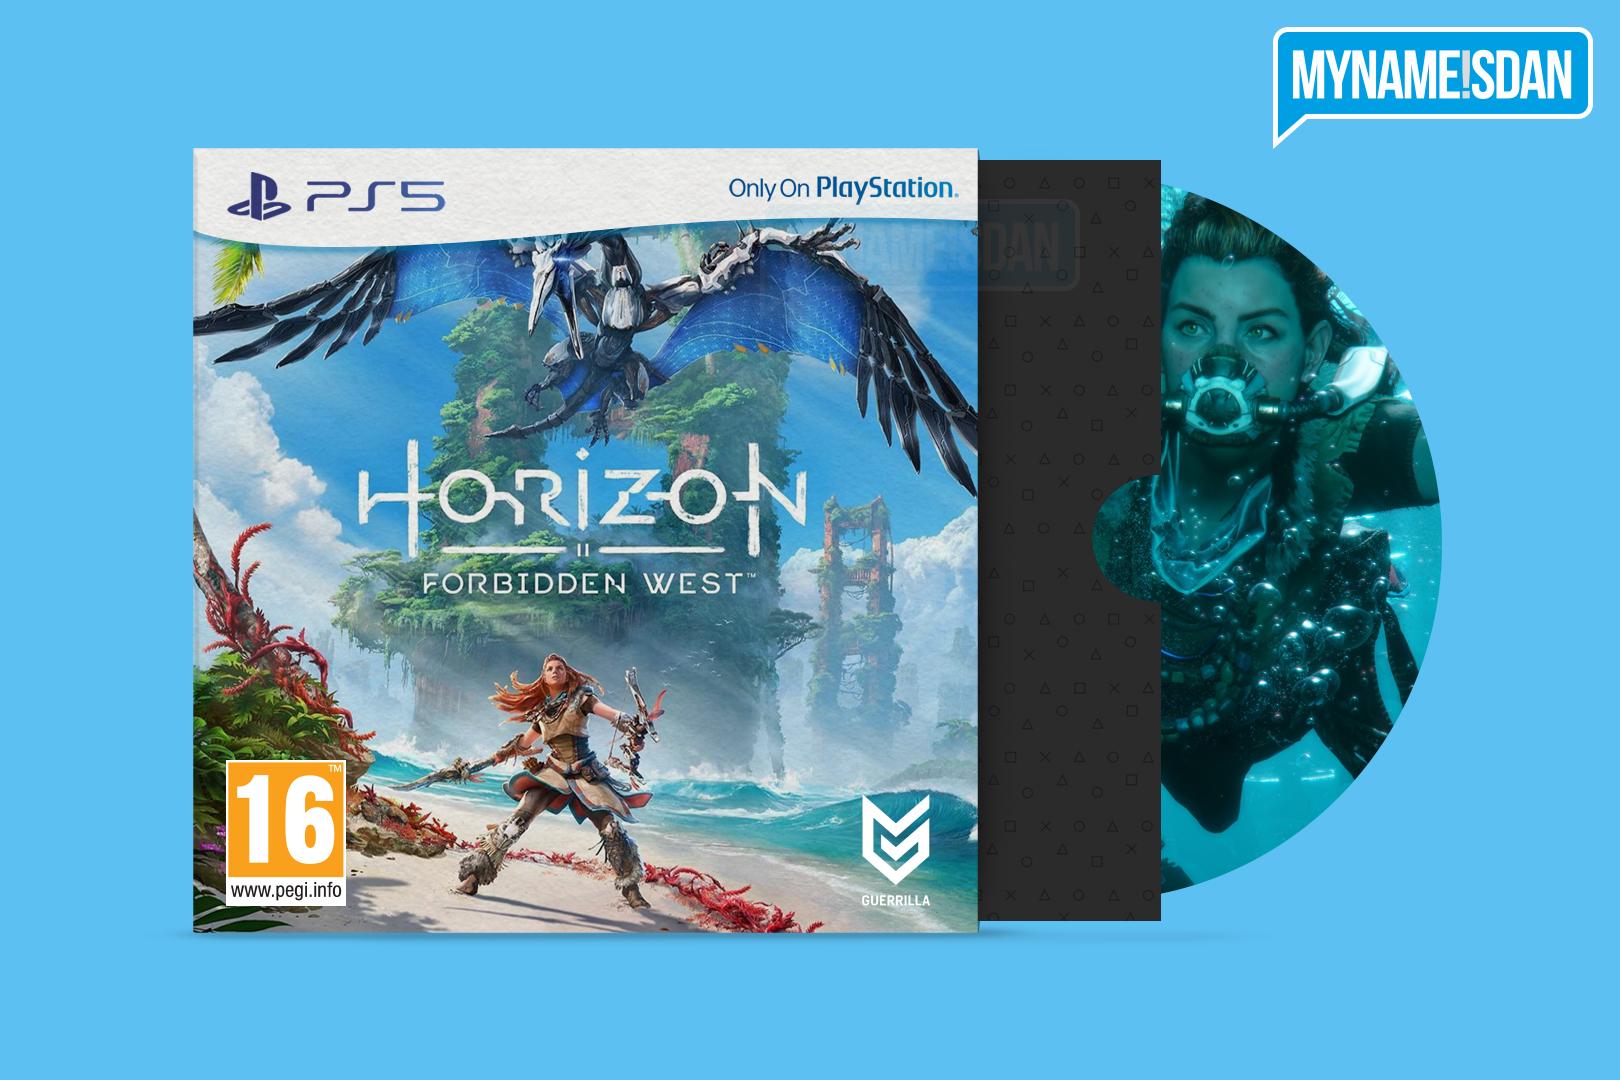 PS5 Cardboard Game Case Concept Design for Horizon Forbidden West